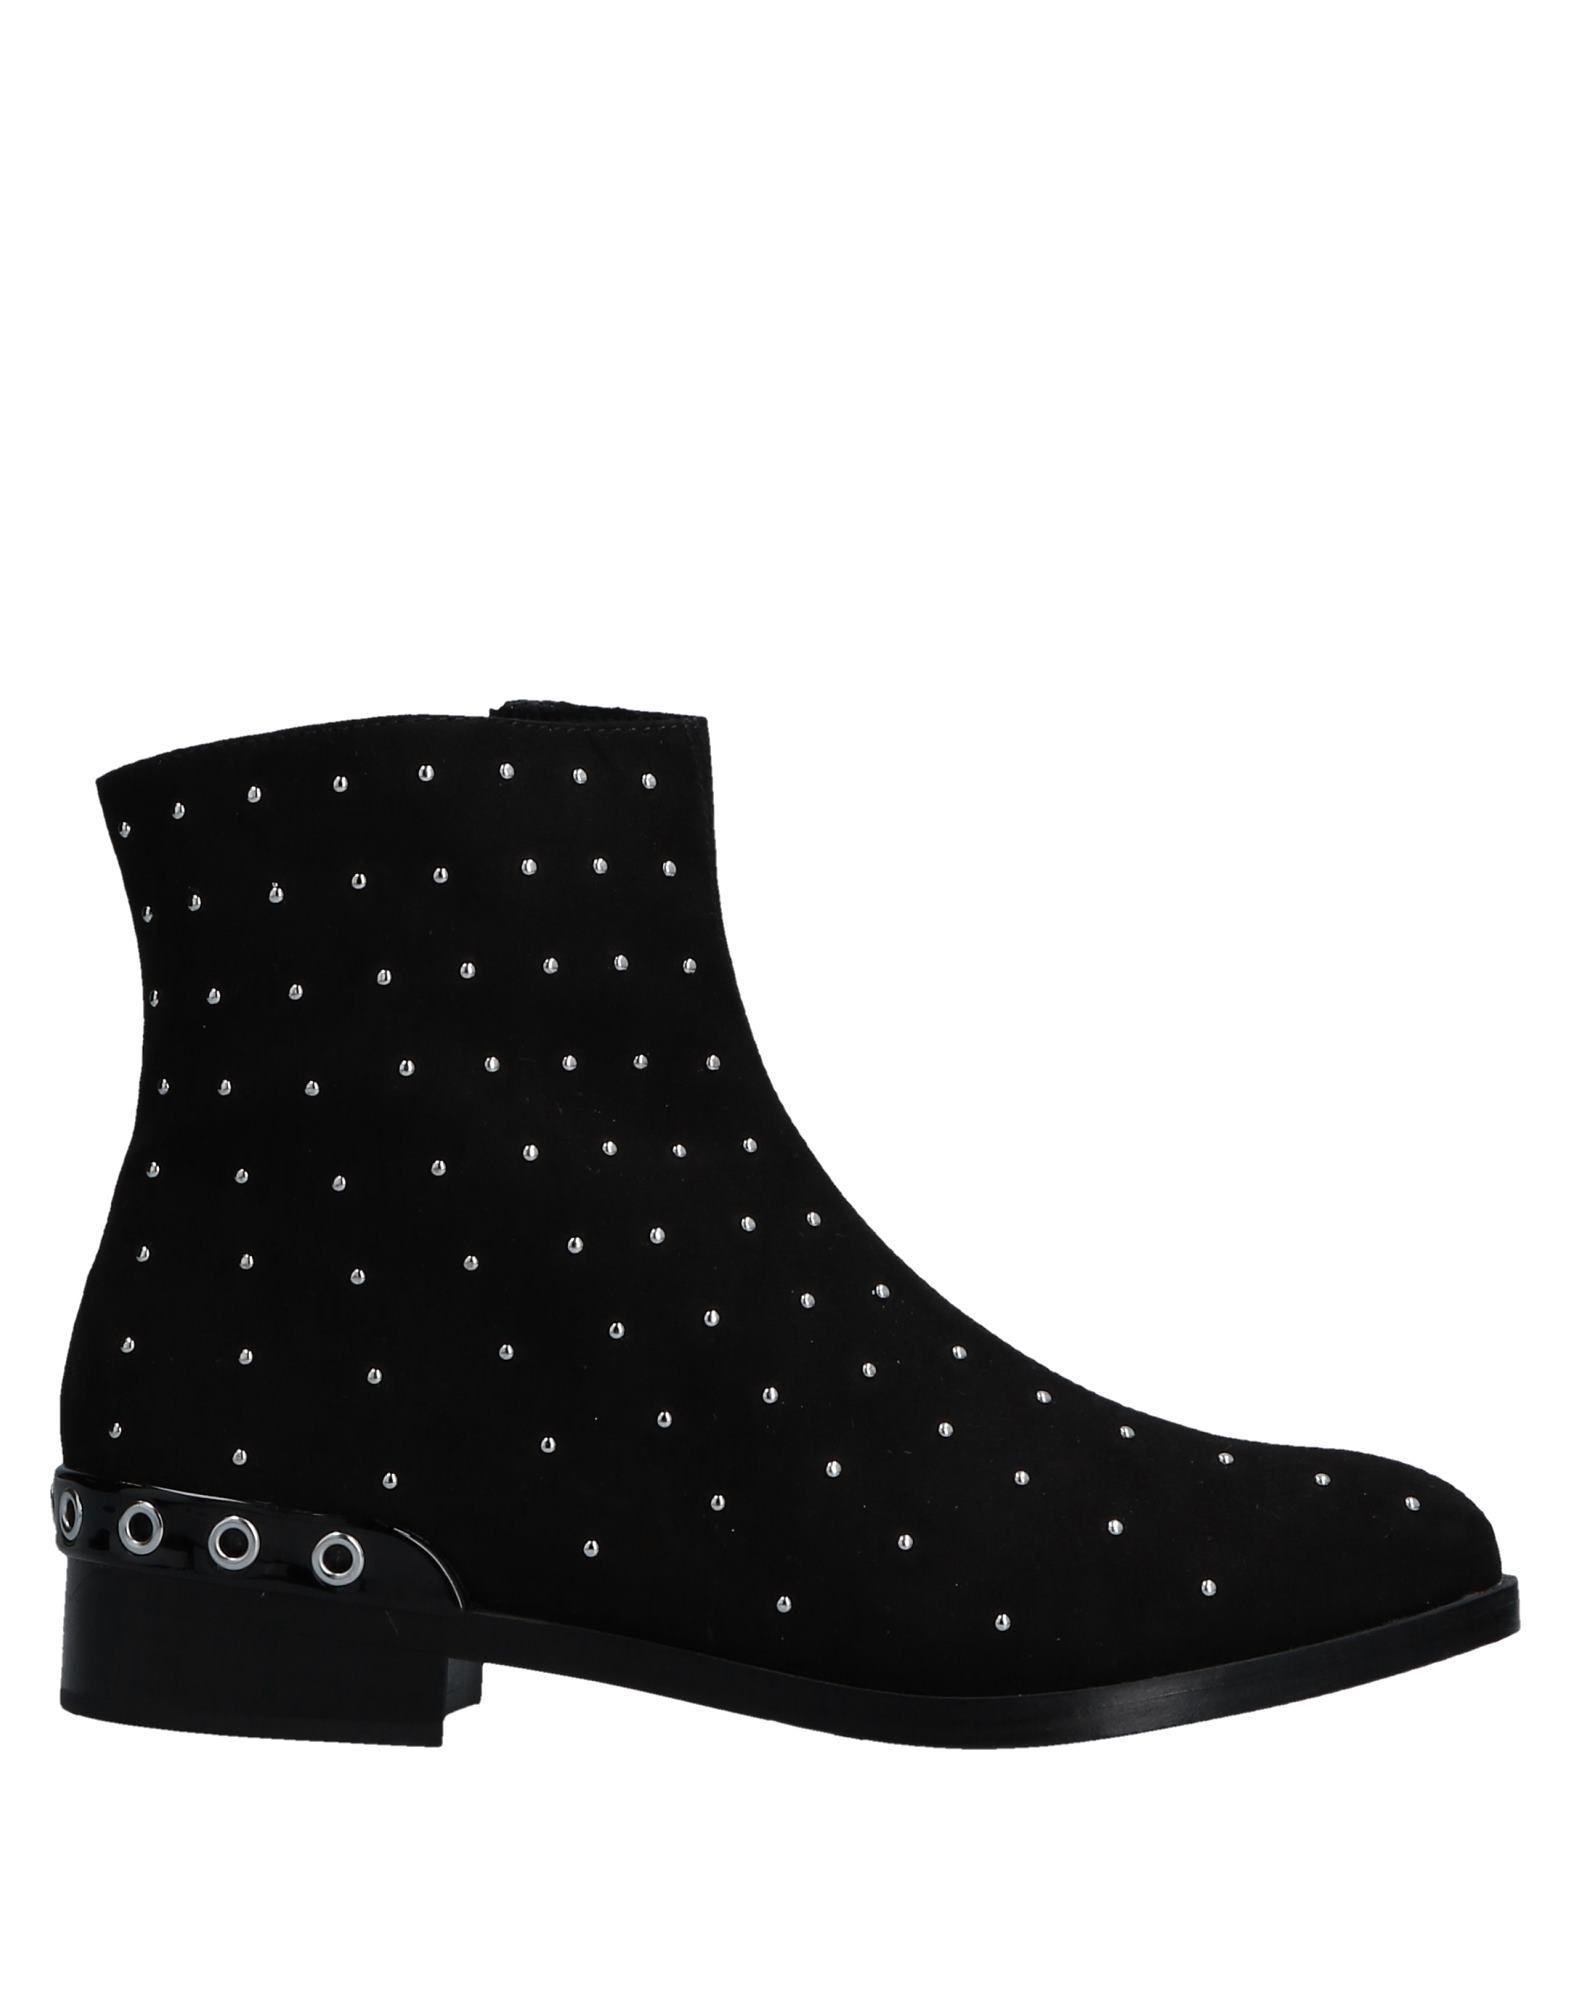 Cafènoir Stiefelette Damen  11515242SM Gute Qualität beliebte Schuhe